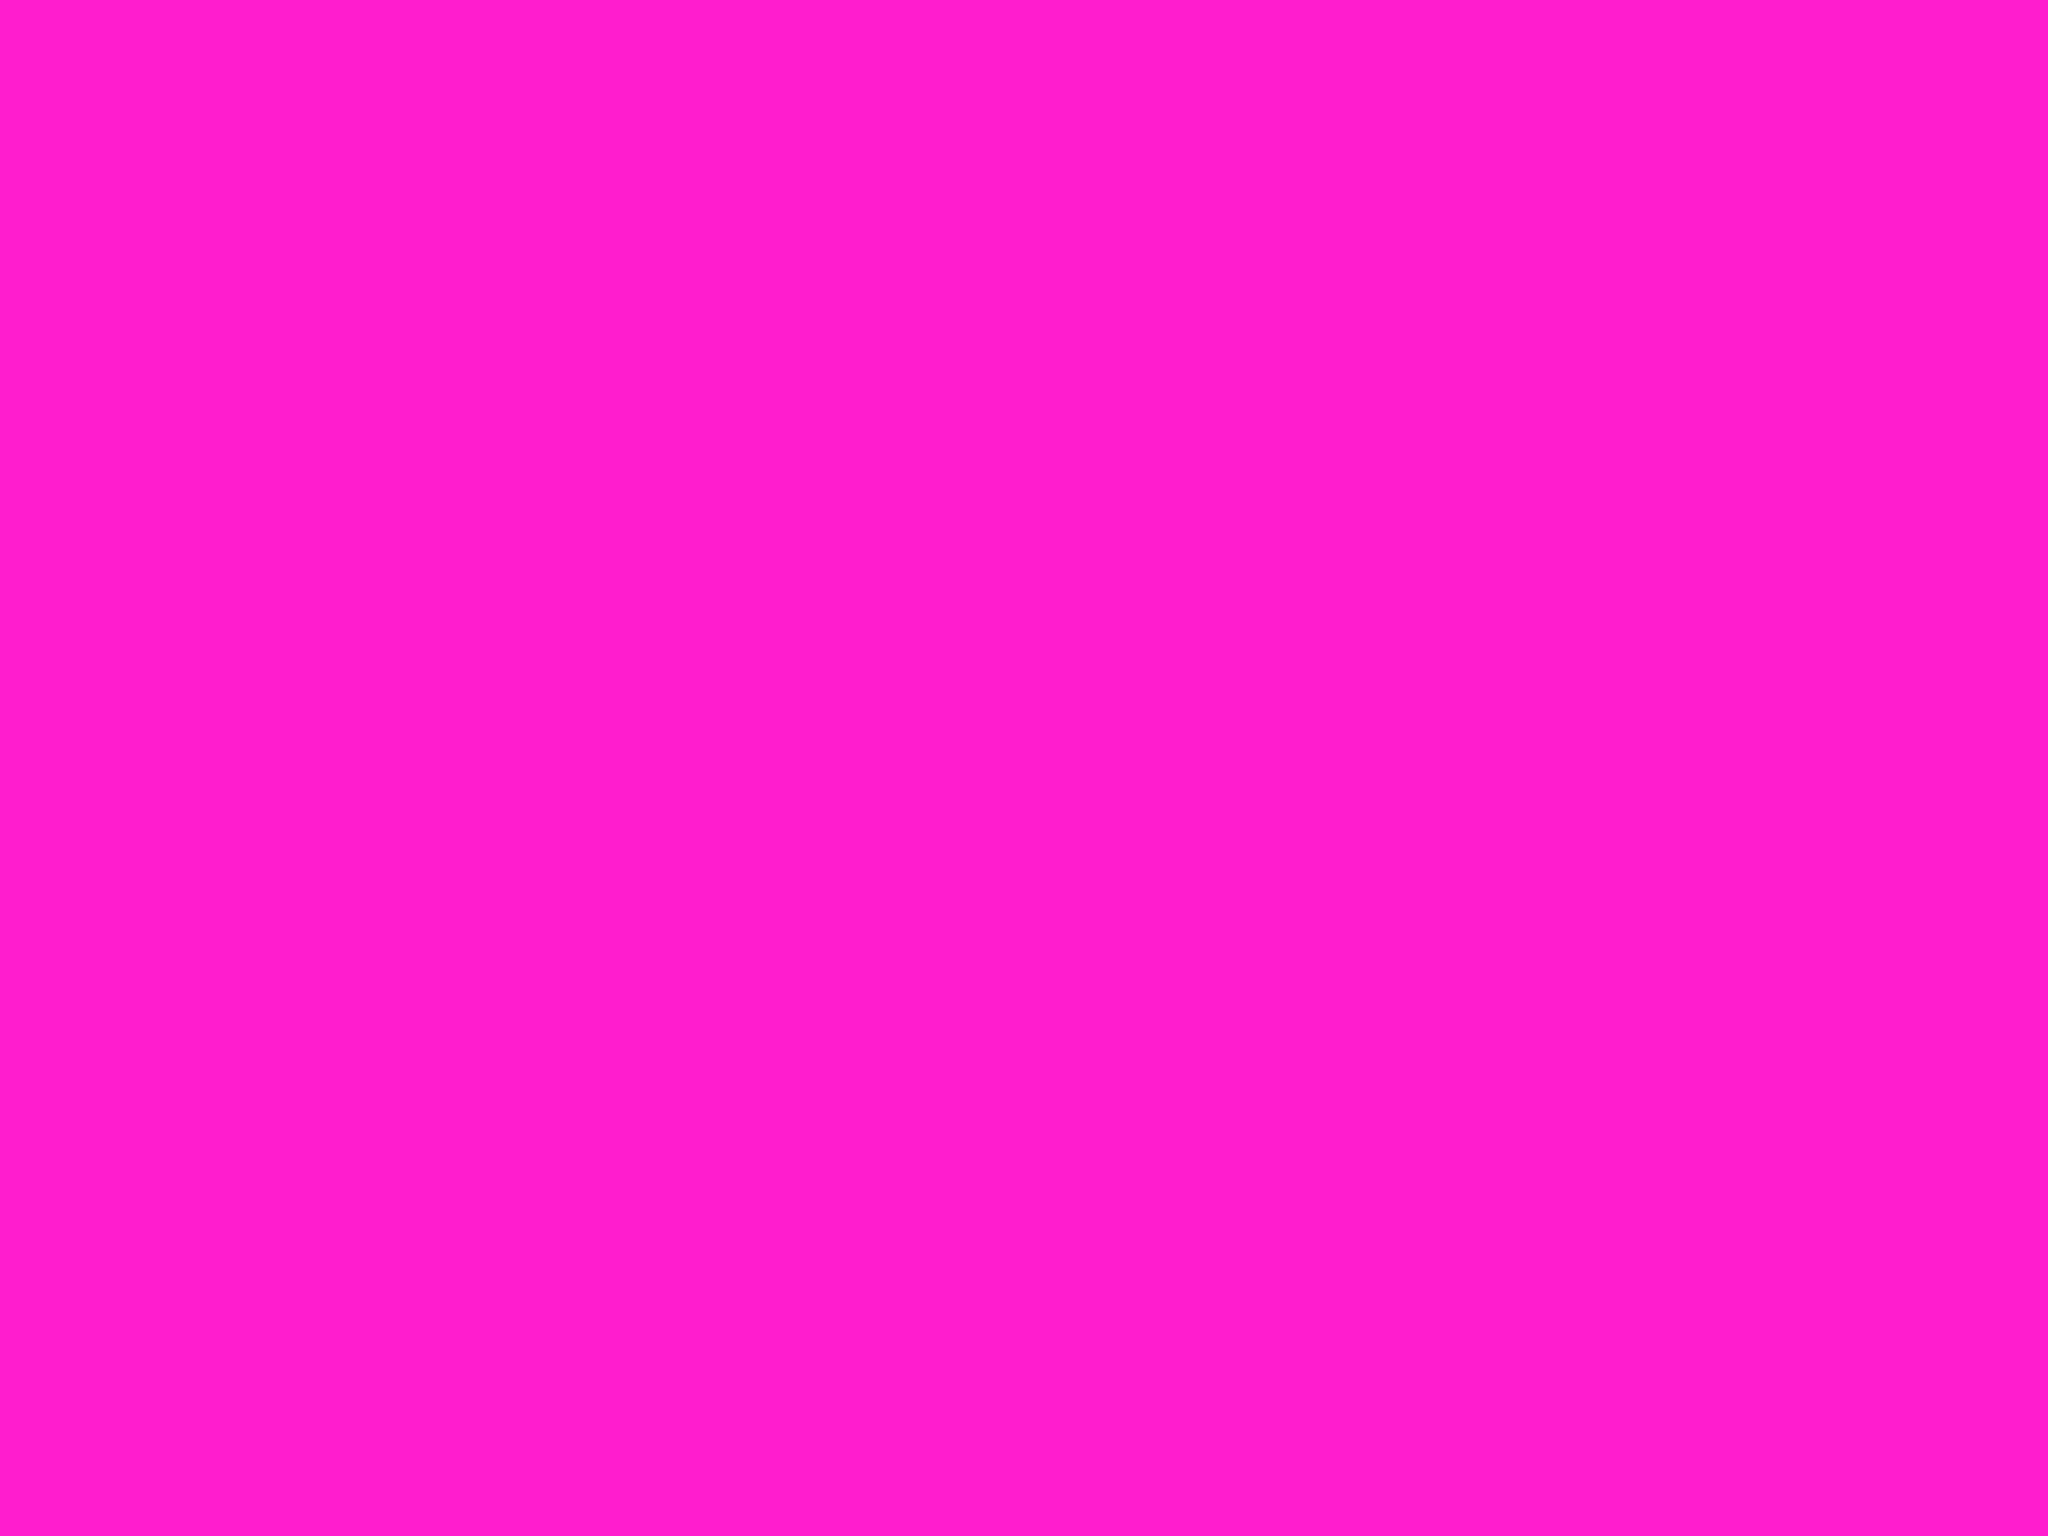 2048x1536 Hot Magenta Solid Color Background